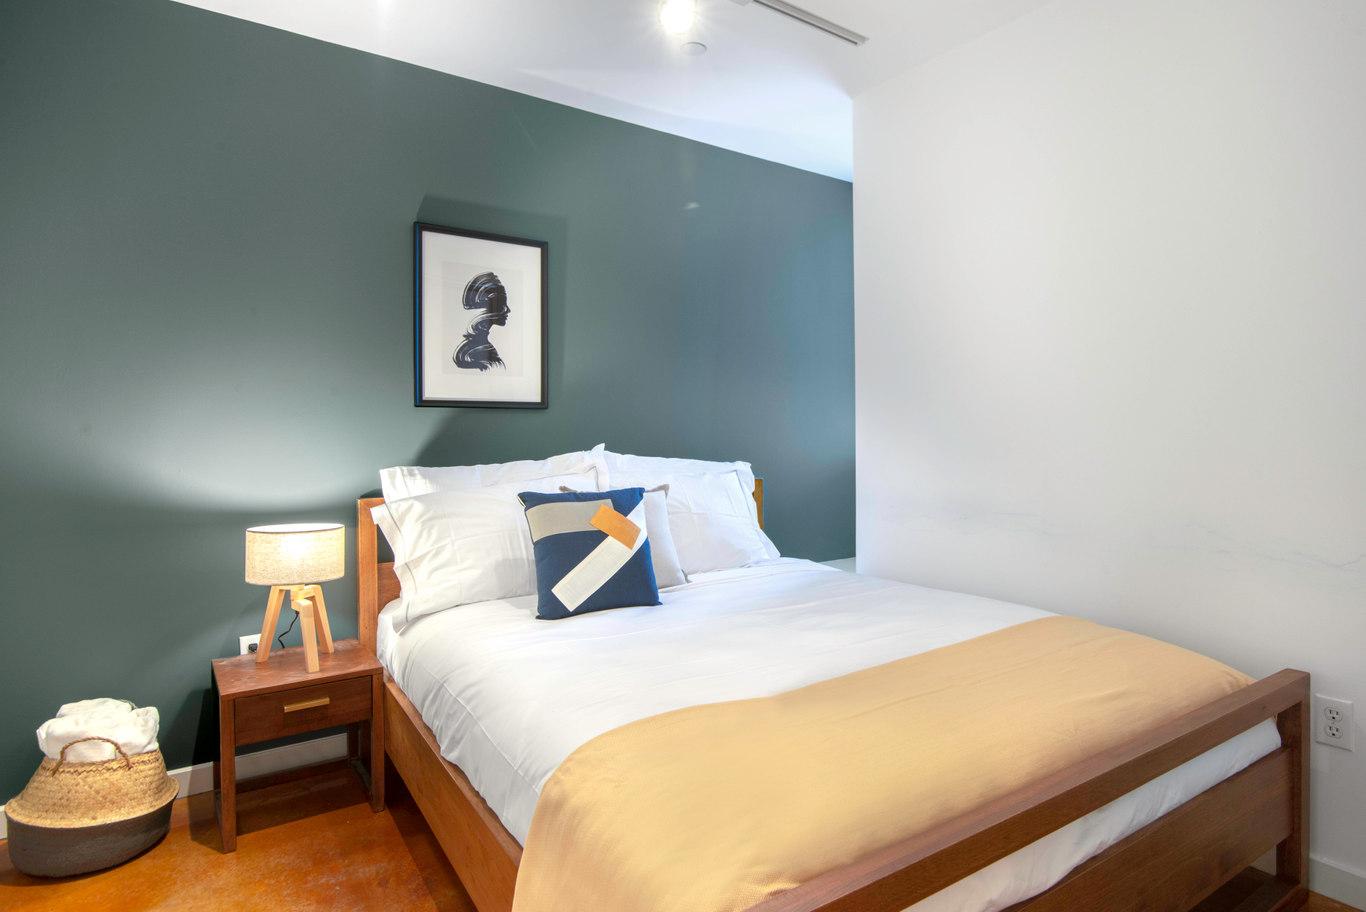 Bedroom at Glasdore Lofts Apartment, Hayes Valley, San Francisco